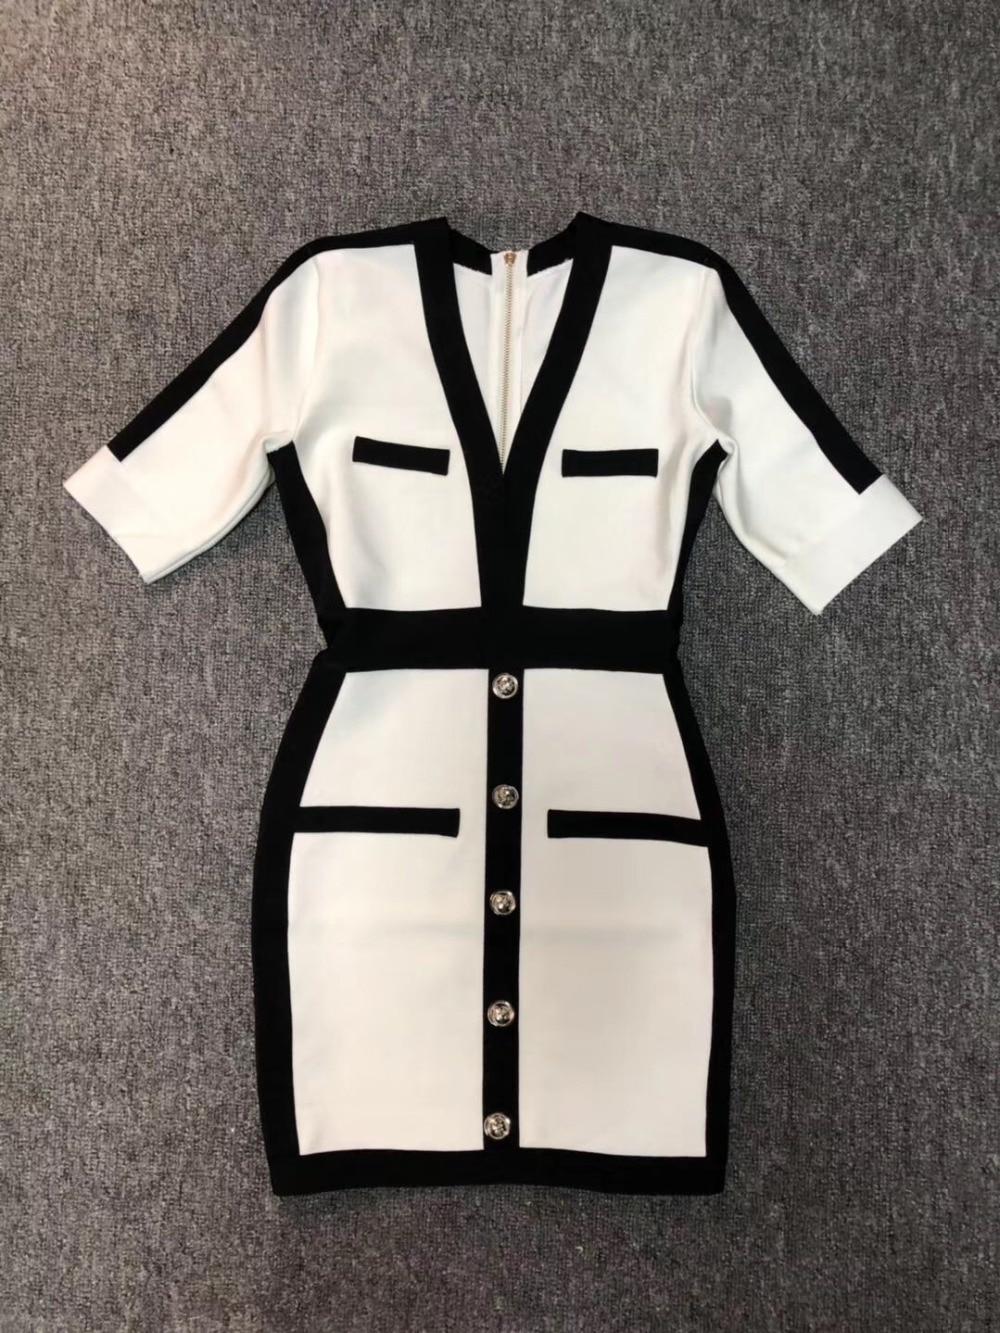 Women Sexy V Neck Half Sleeve Bandage Dress 19 Ladies Elegant Designer Bodycon Bandage Dress 2